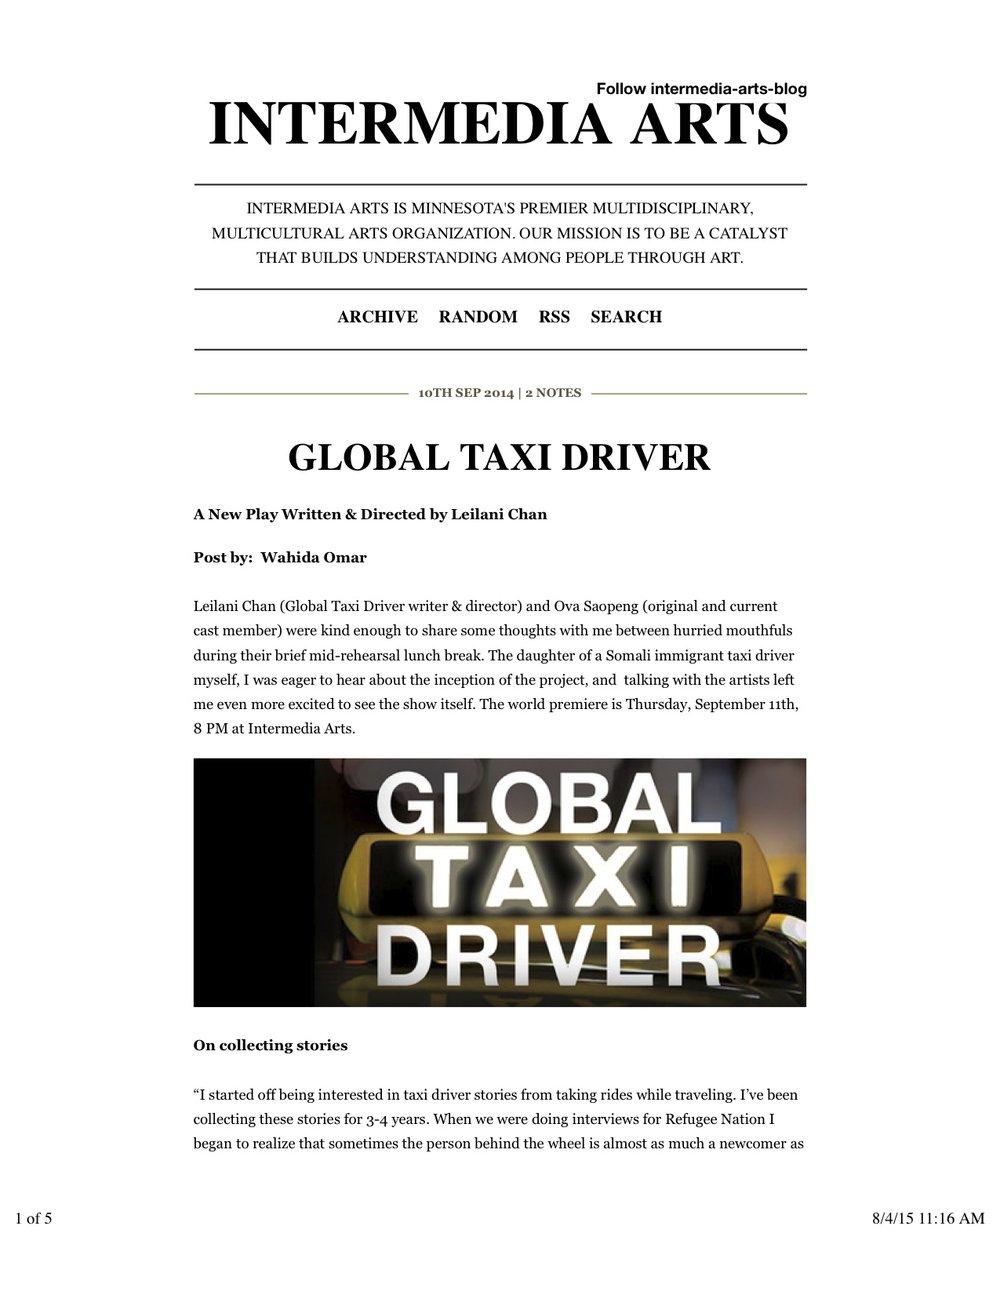 GTD IA Blog.jpg